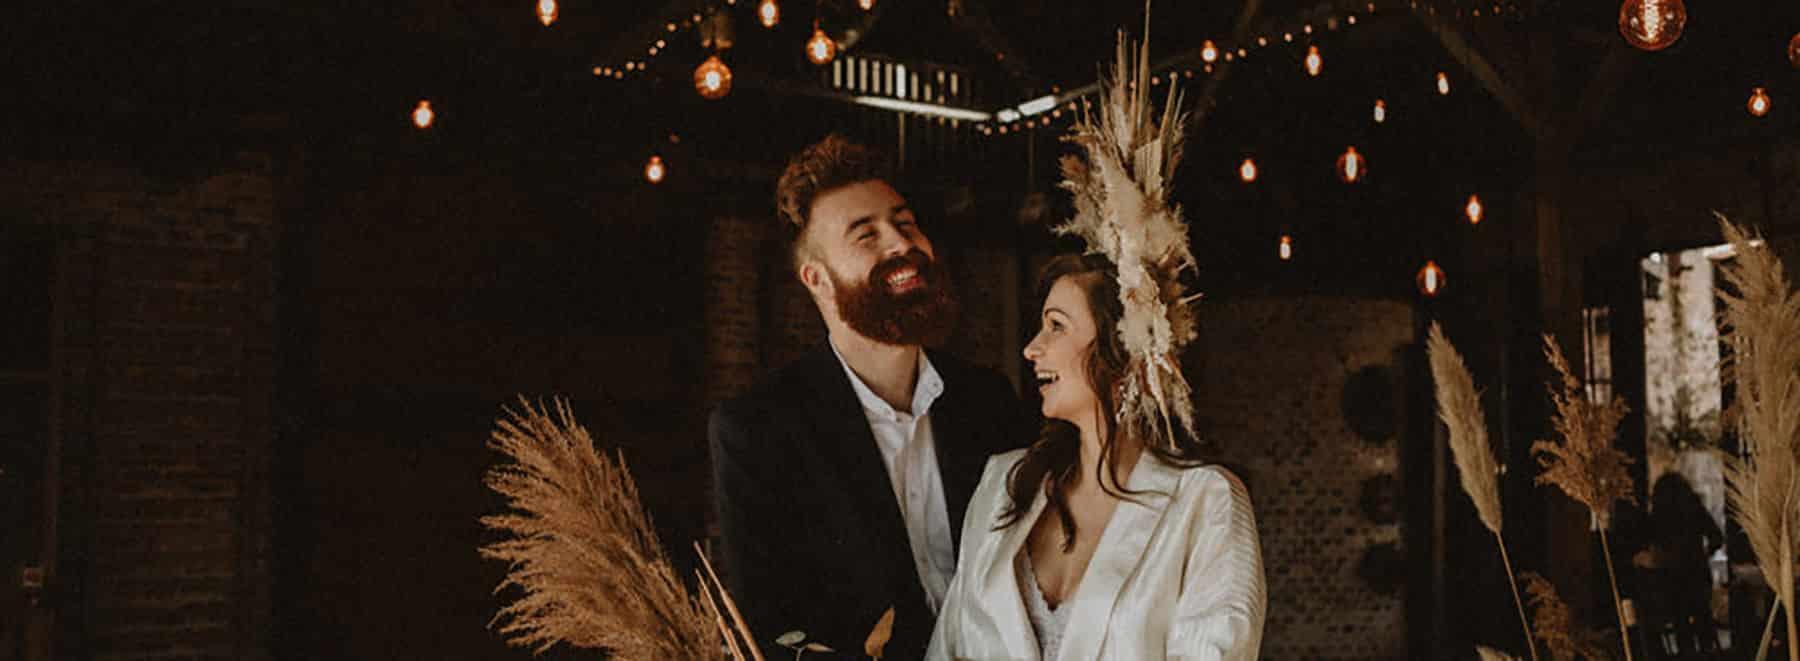 mariage vaison la romaine